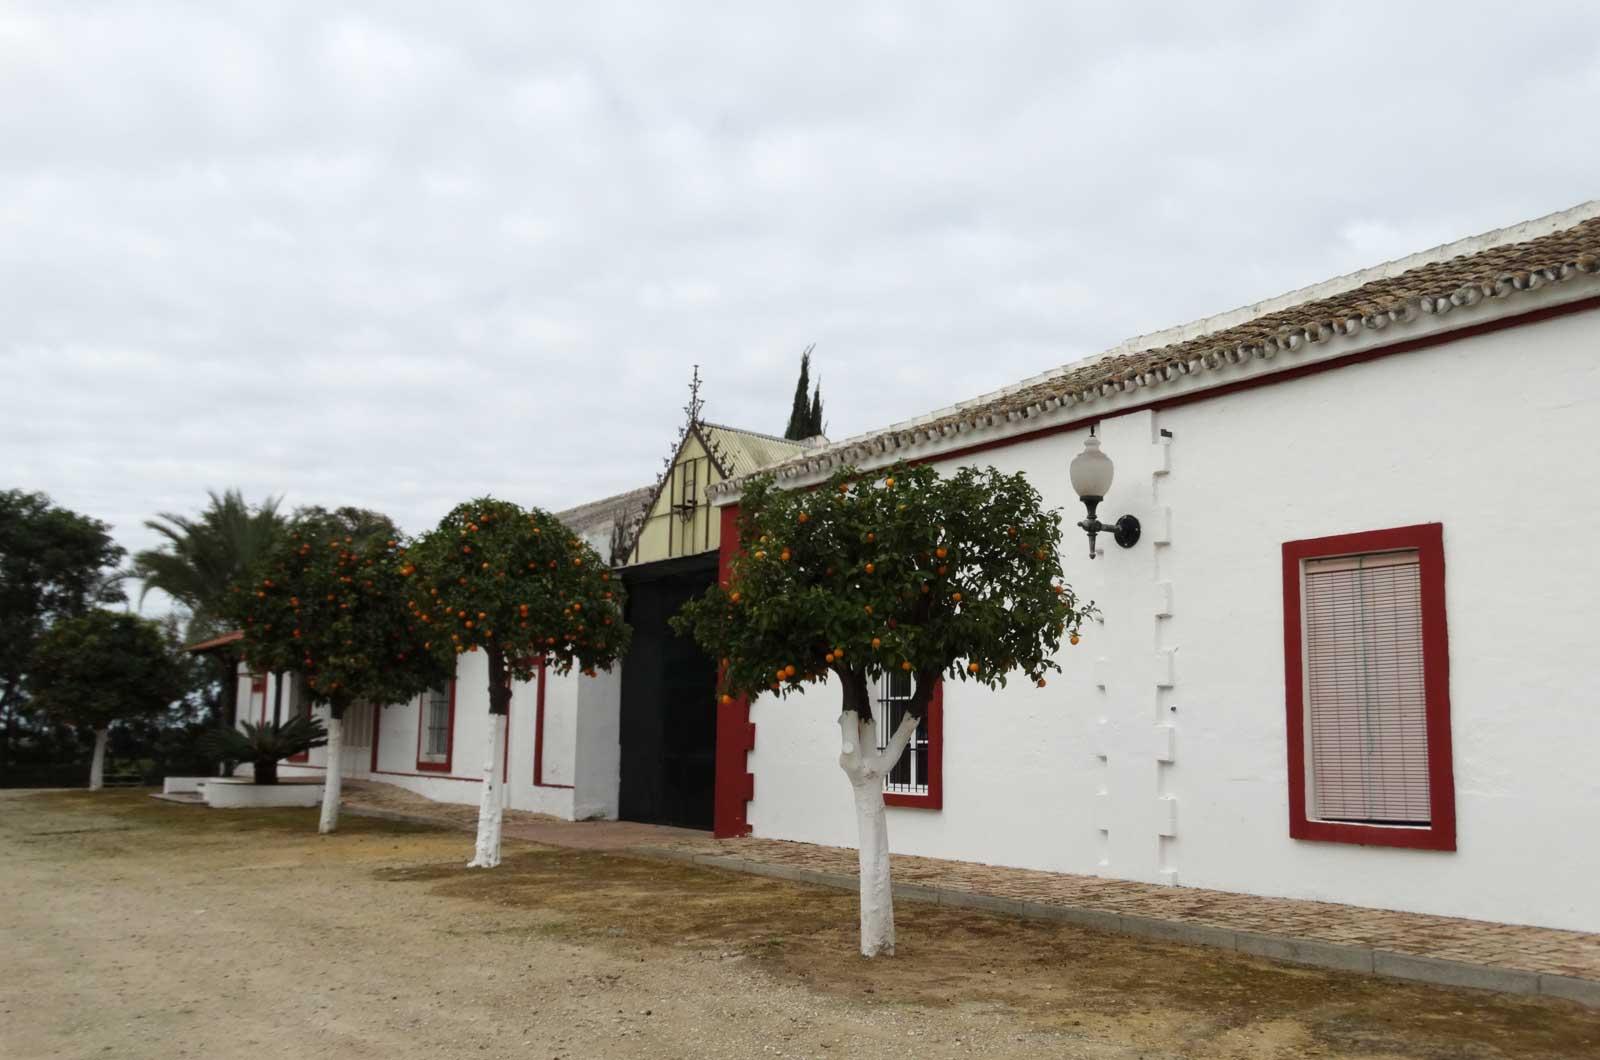 Hacienda El Trobal - entrada<div style='clear:both;width:100%;height:0px;'></div><span class='cat'>Hacienda El Trobal</span><div style='clear:both;width:100%;height:0px;'></div><span class='desc'>Hacienda El Trobal - entrada</span>